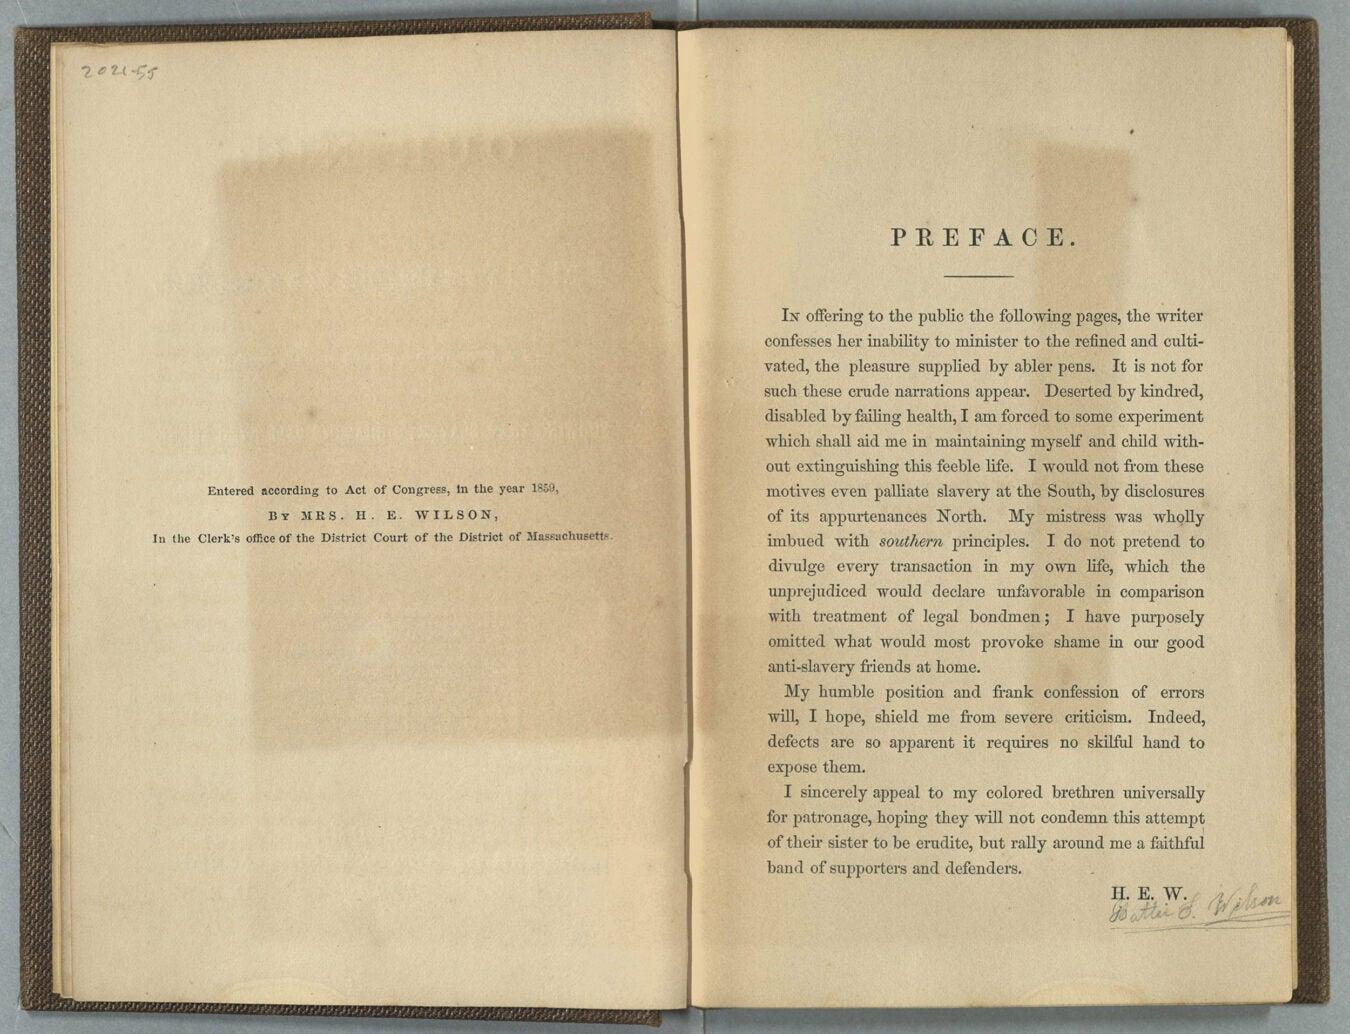 Preface of book